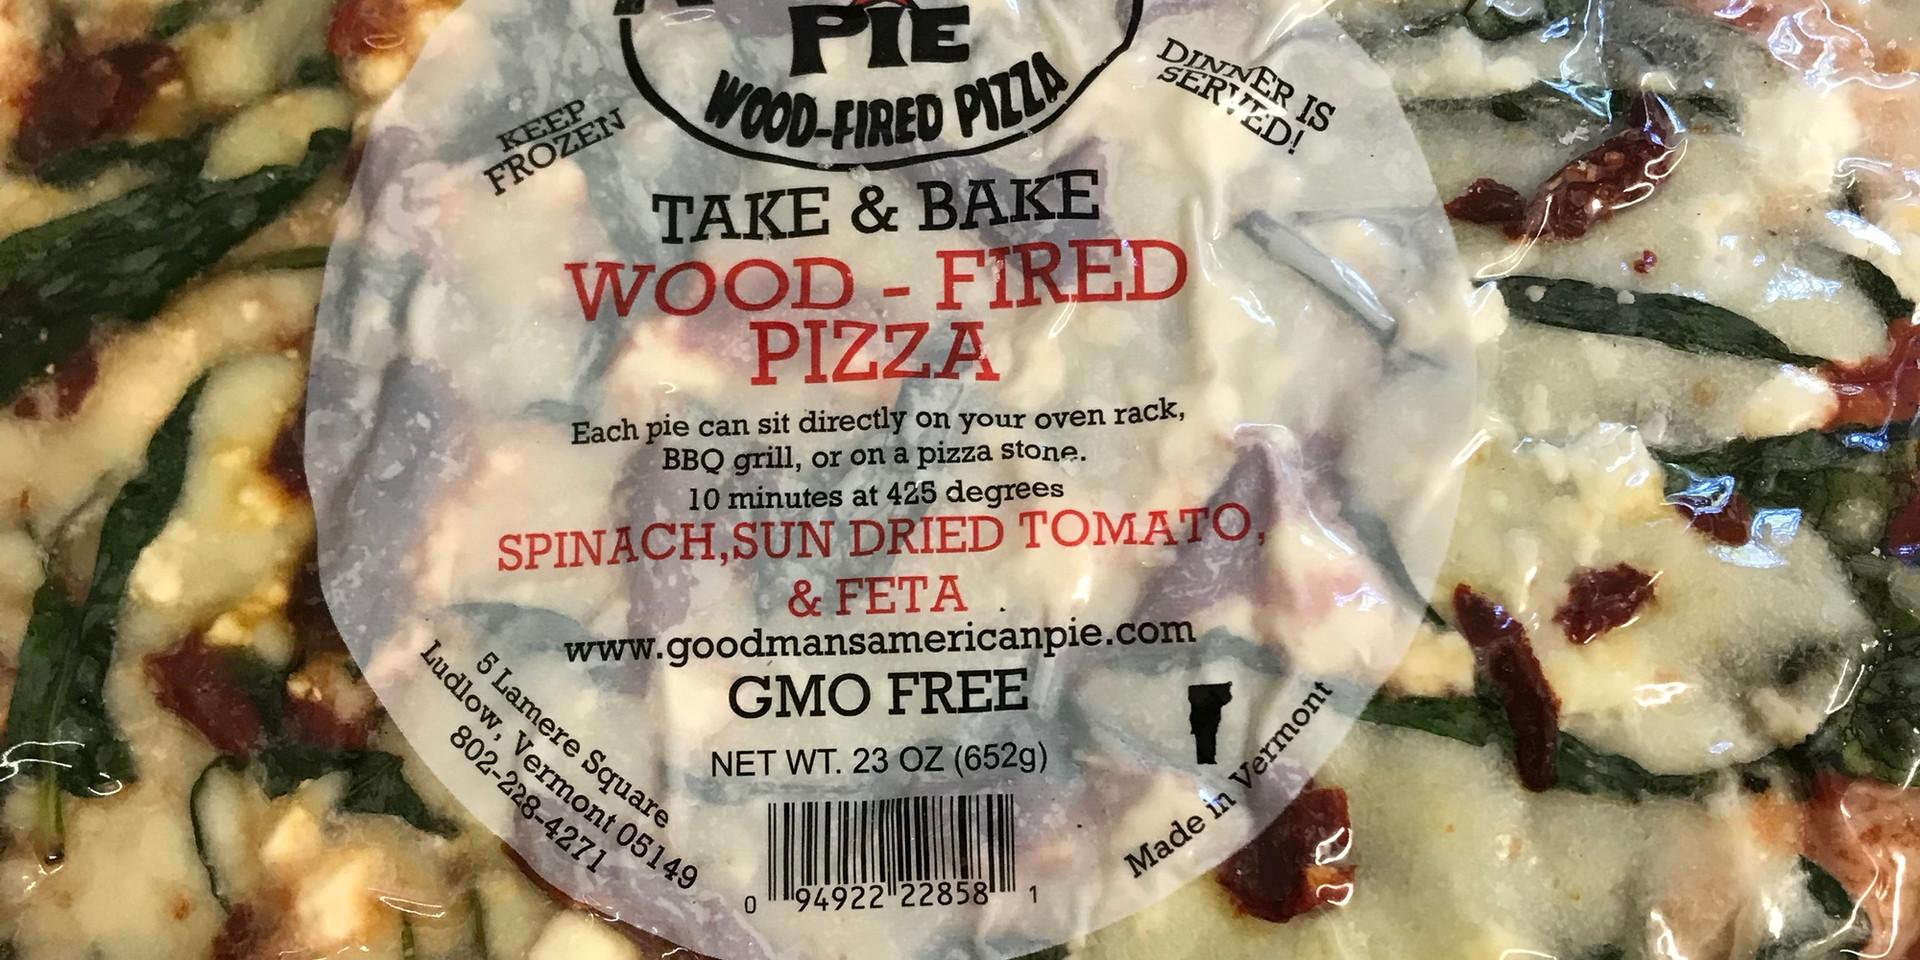 Goodmans American Pie Pizza